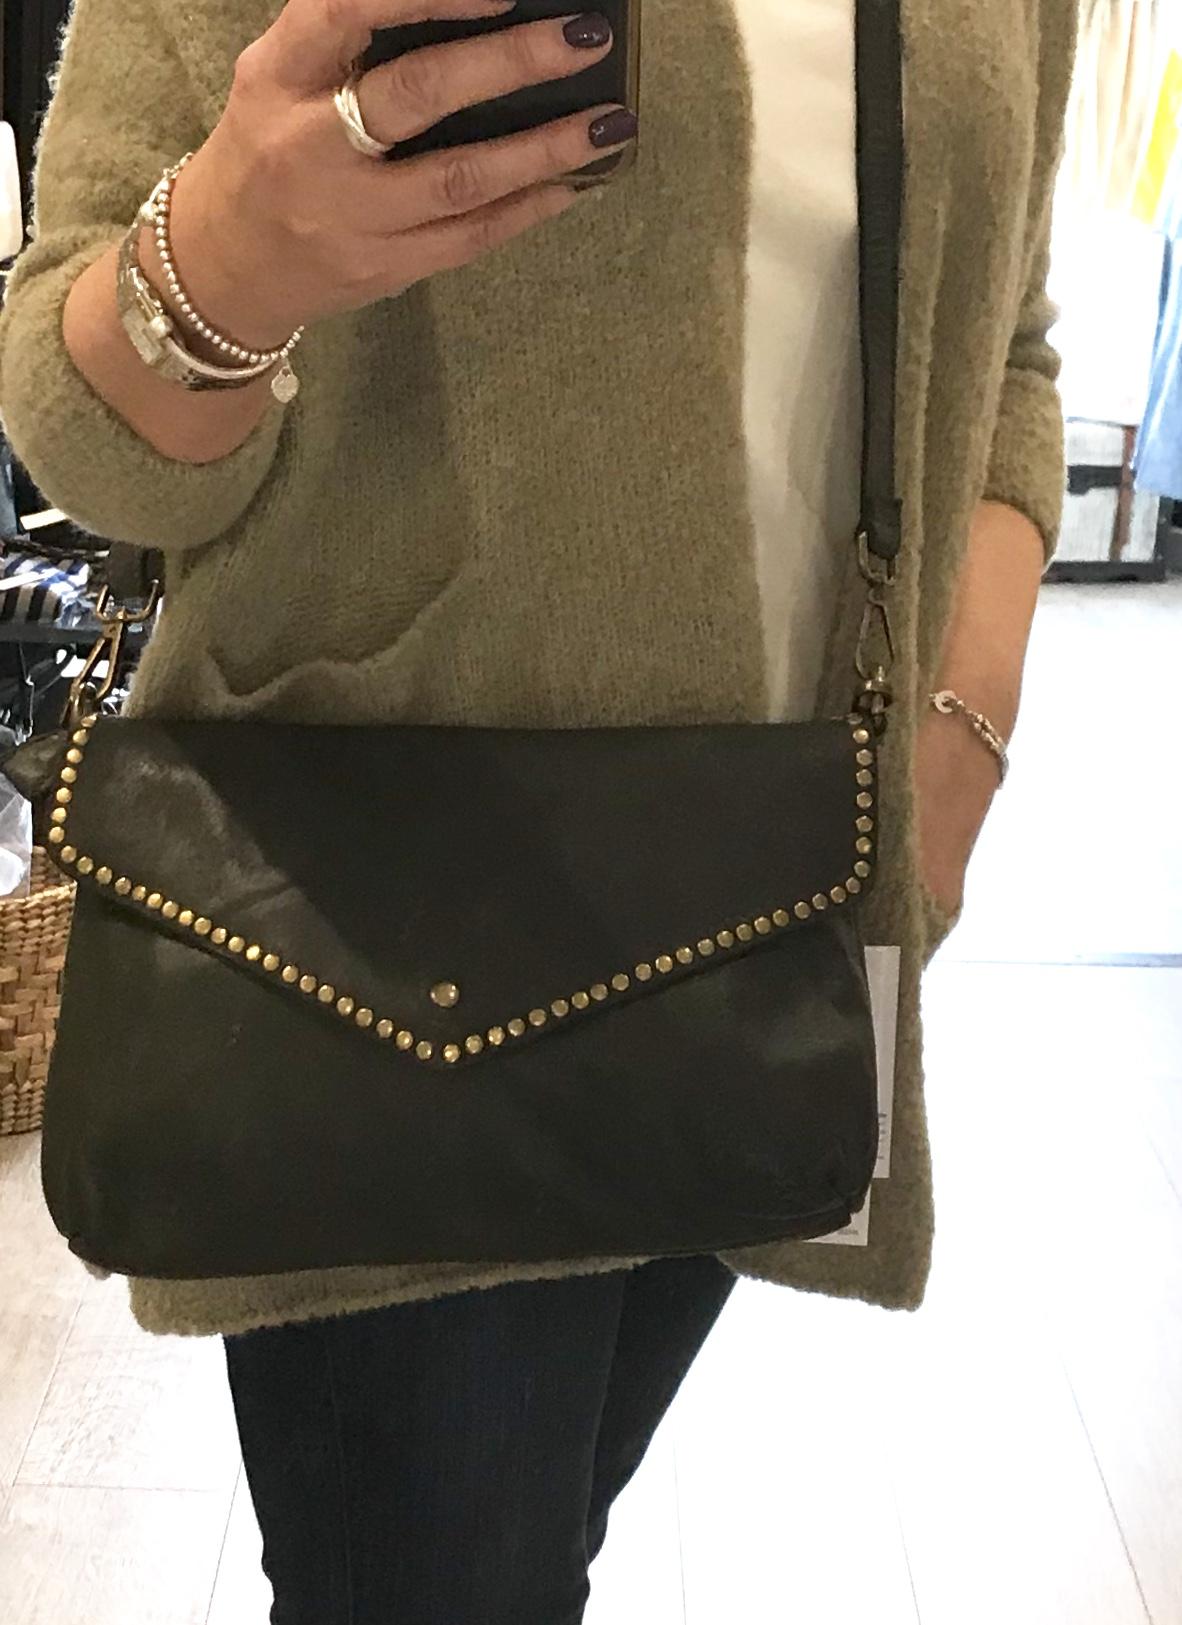 Mercury Bags